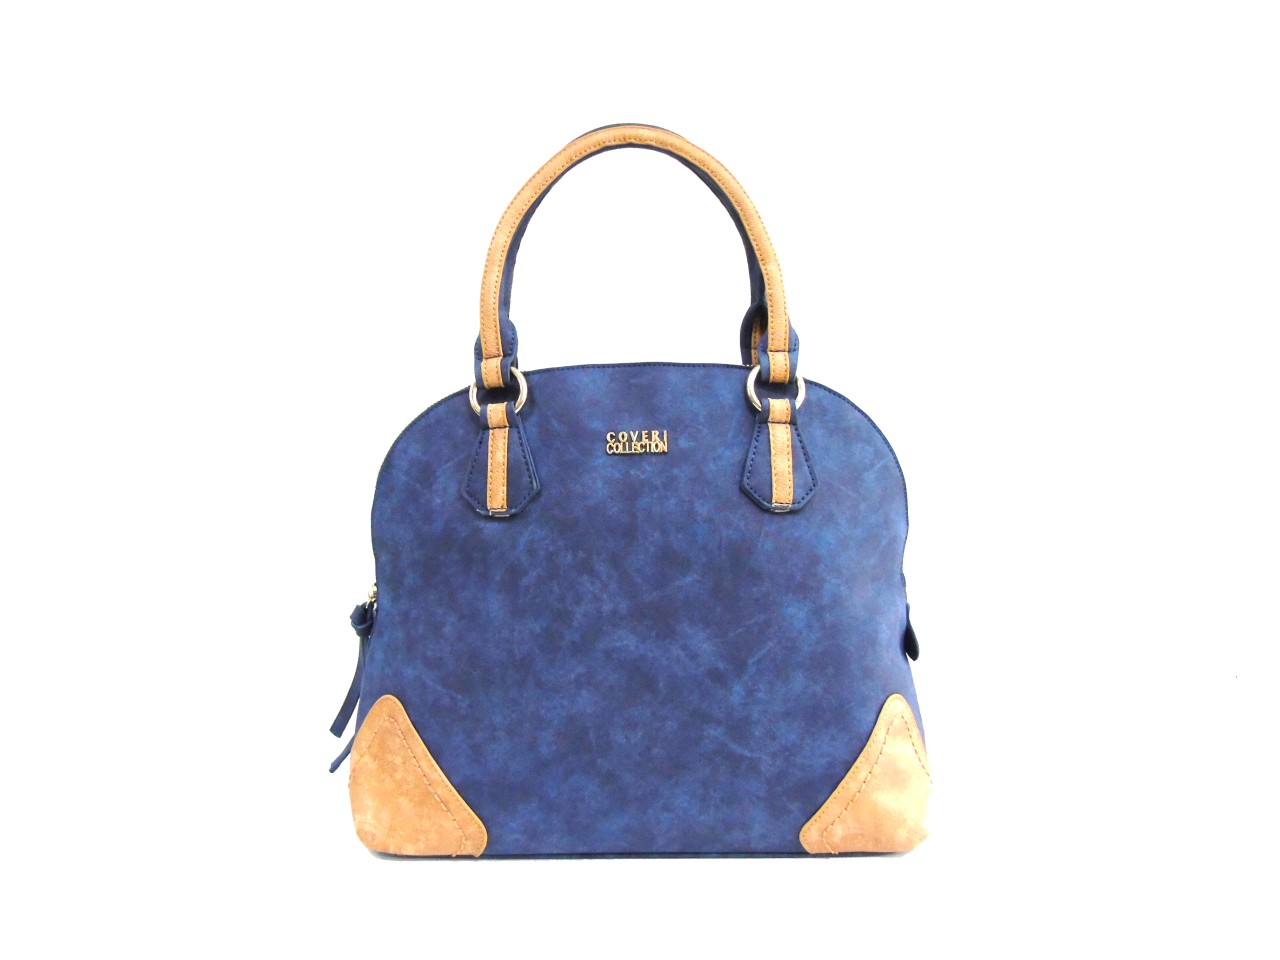 Blu shopping 2 A Borsa Mod Collection Coveri Mano Donna 172227 qVSMzpUG